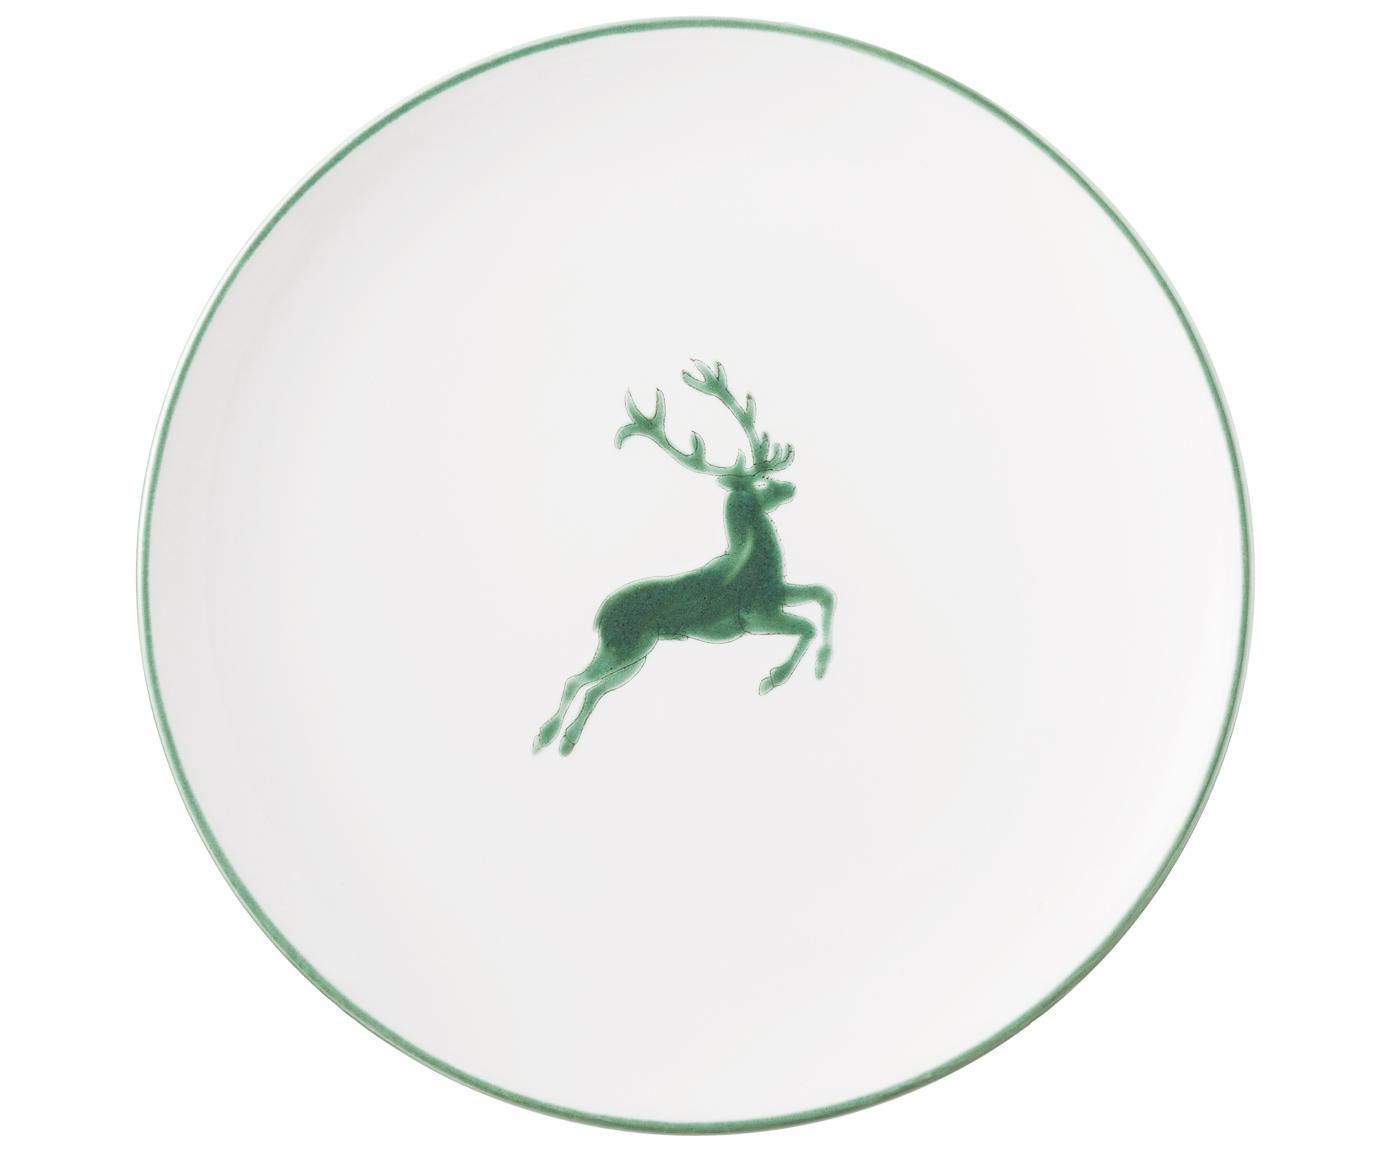 Speiseteller Classic Grüner Hirsch, Keramik, Weiß, Ø 25 cm